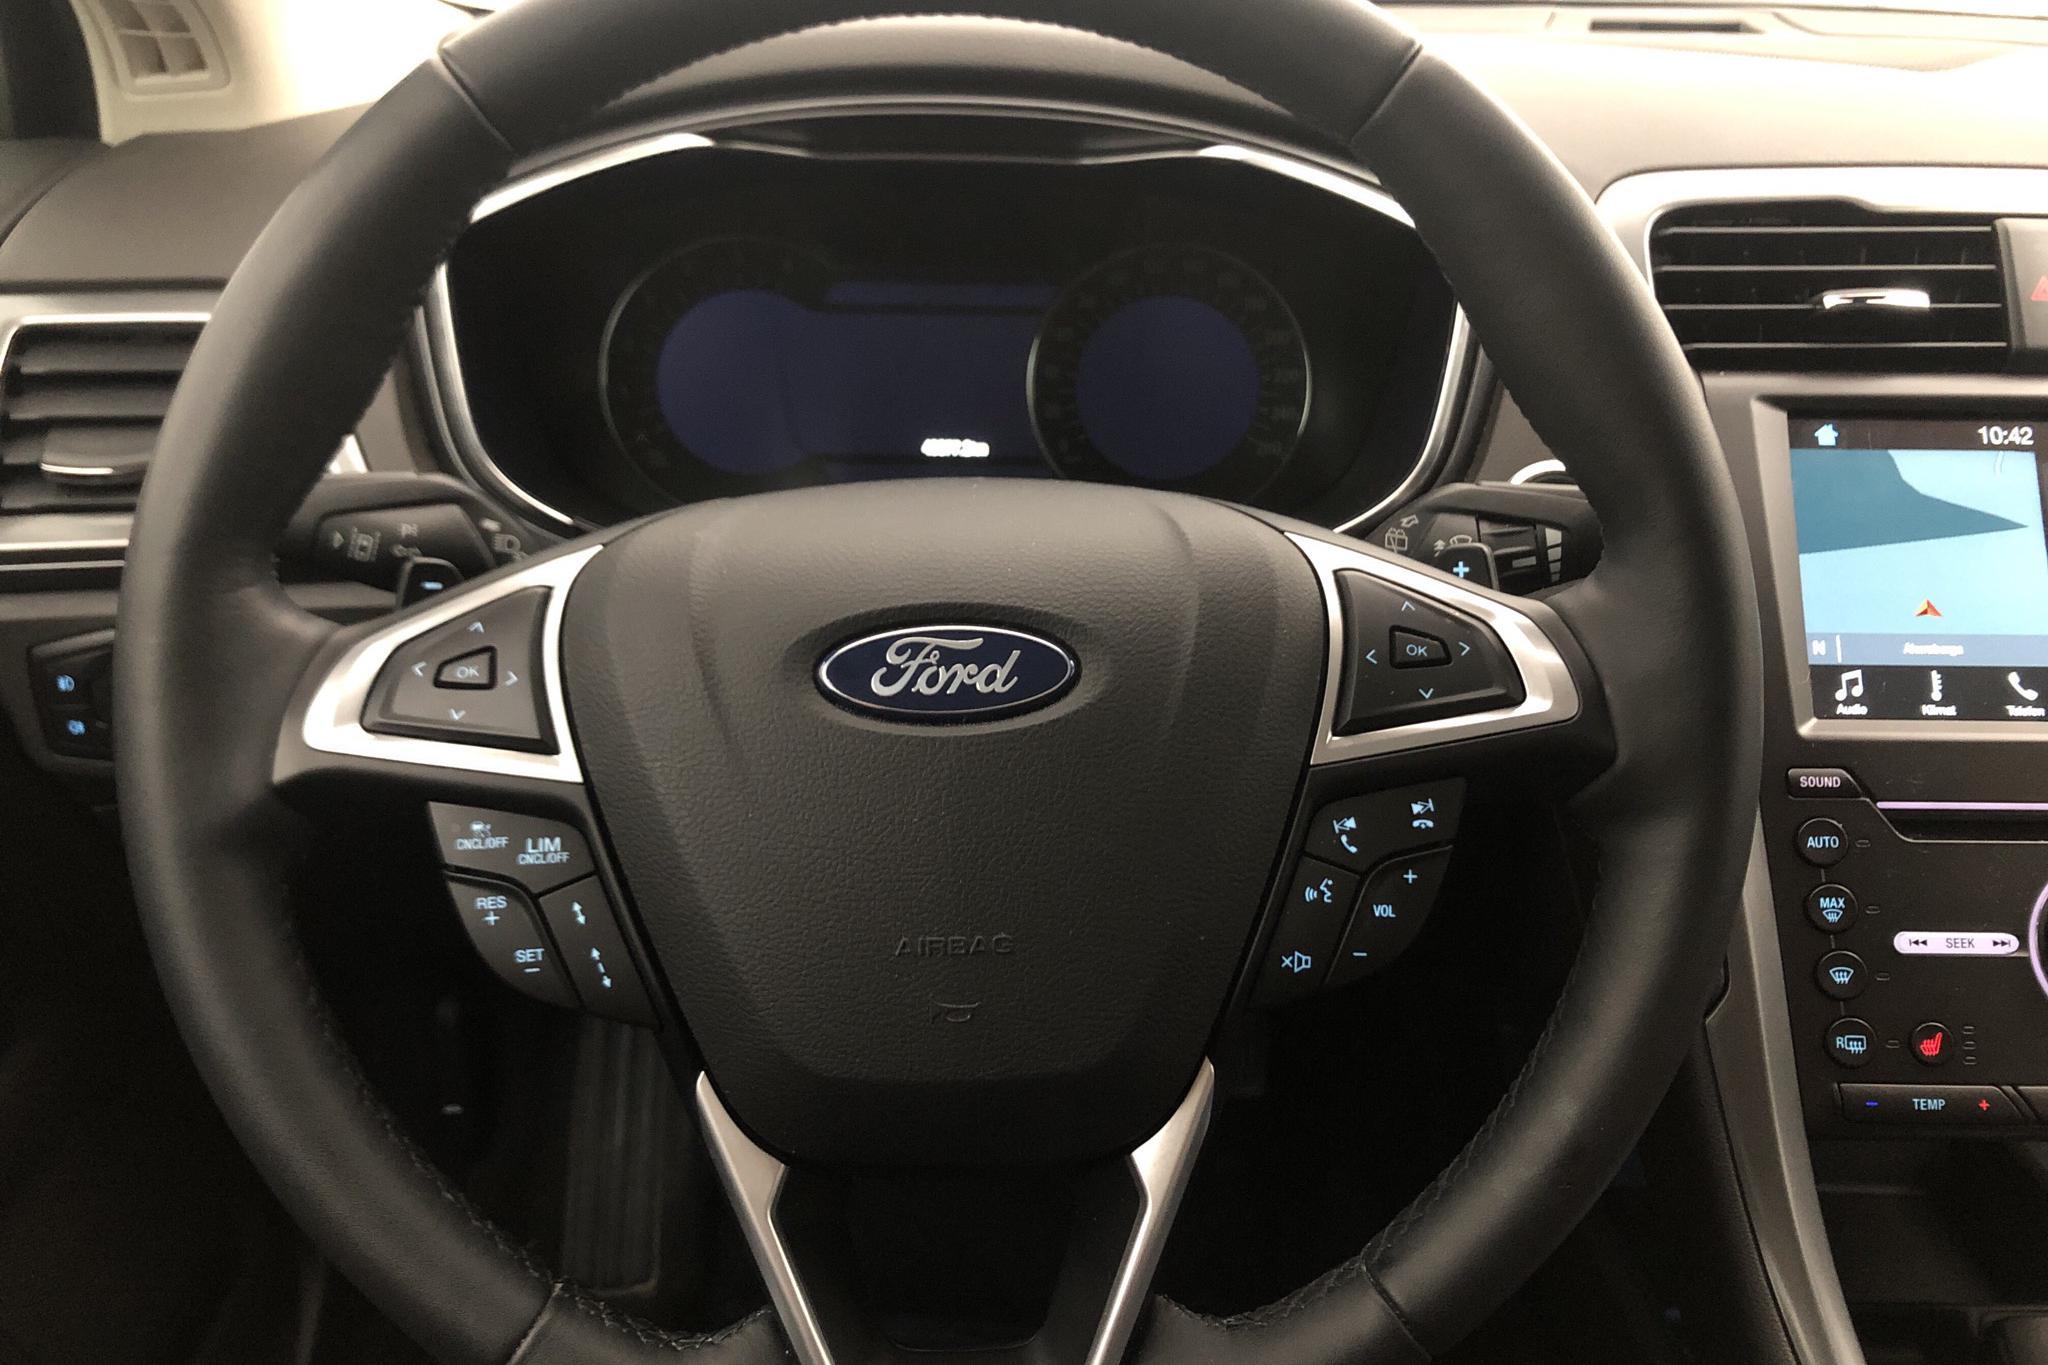 Ford Mondeo 2.0 TDCi AWD Kombi (180hk) - 40 370 km - Automatic - white - 2017